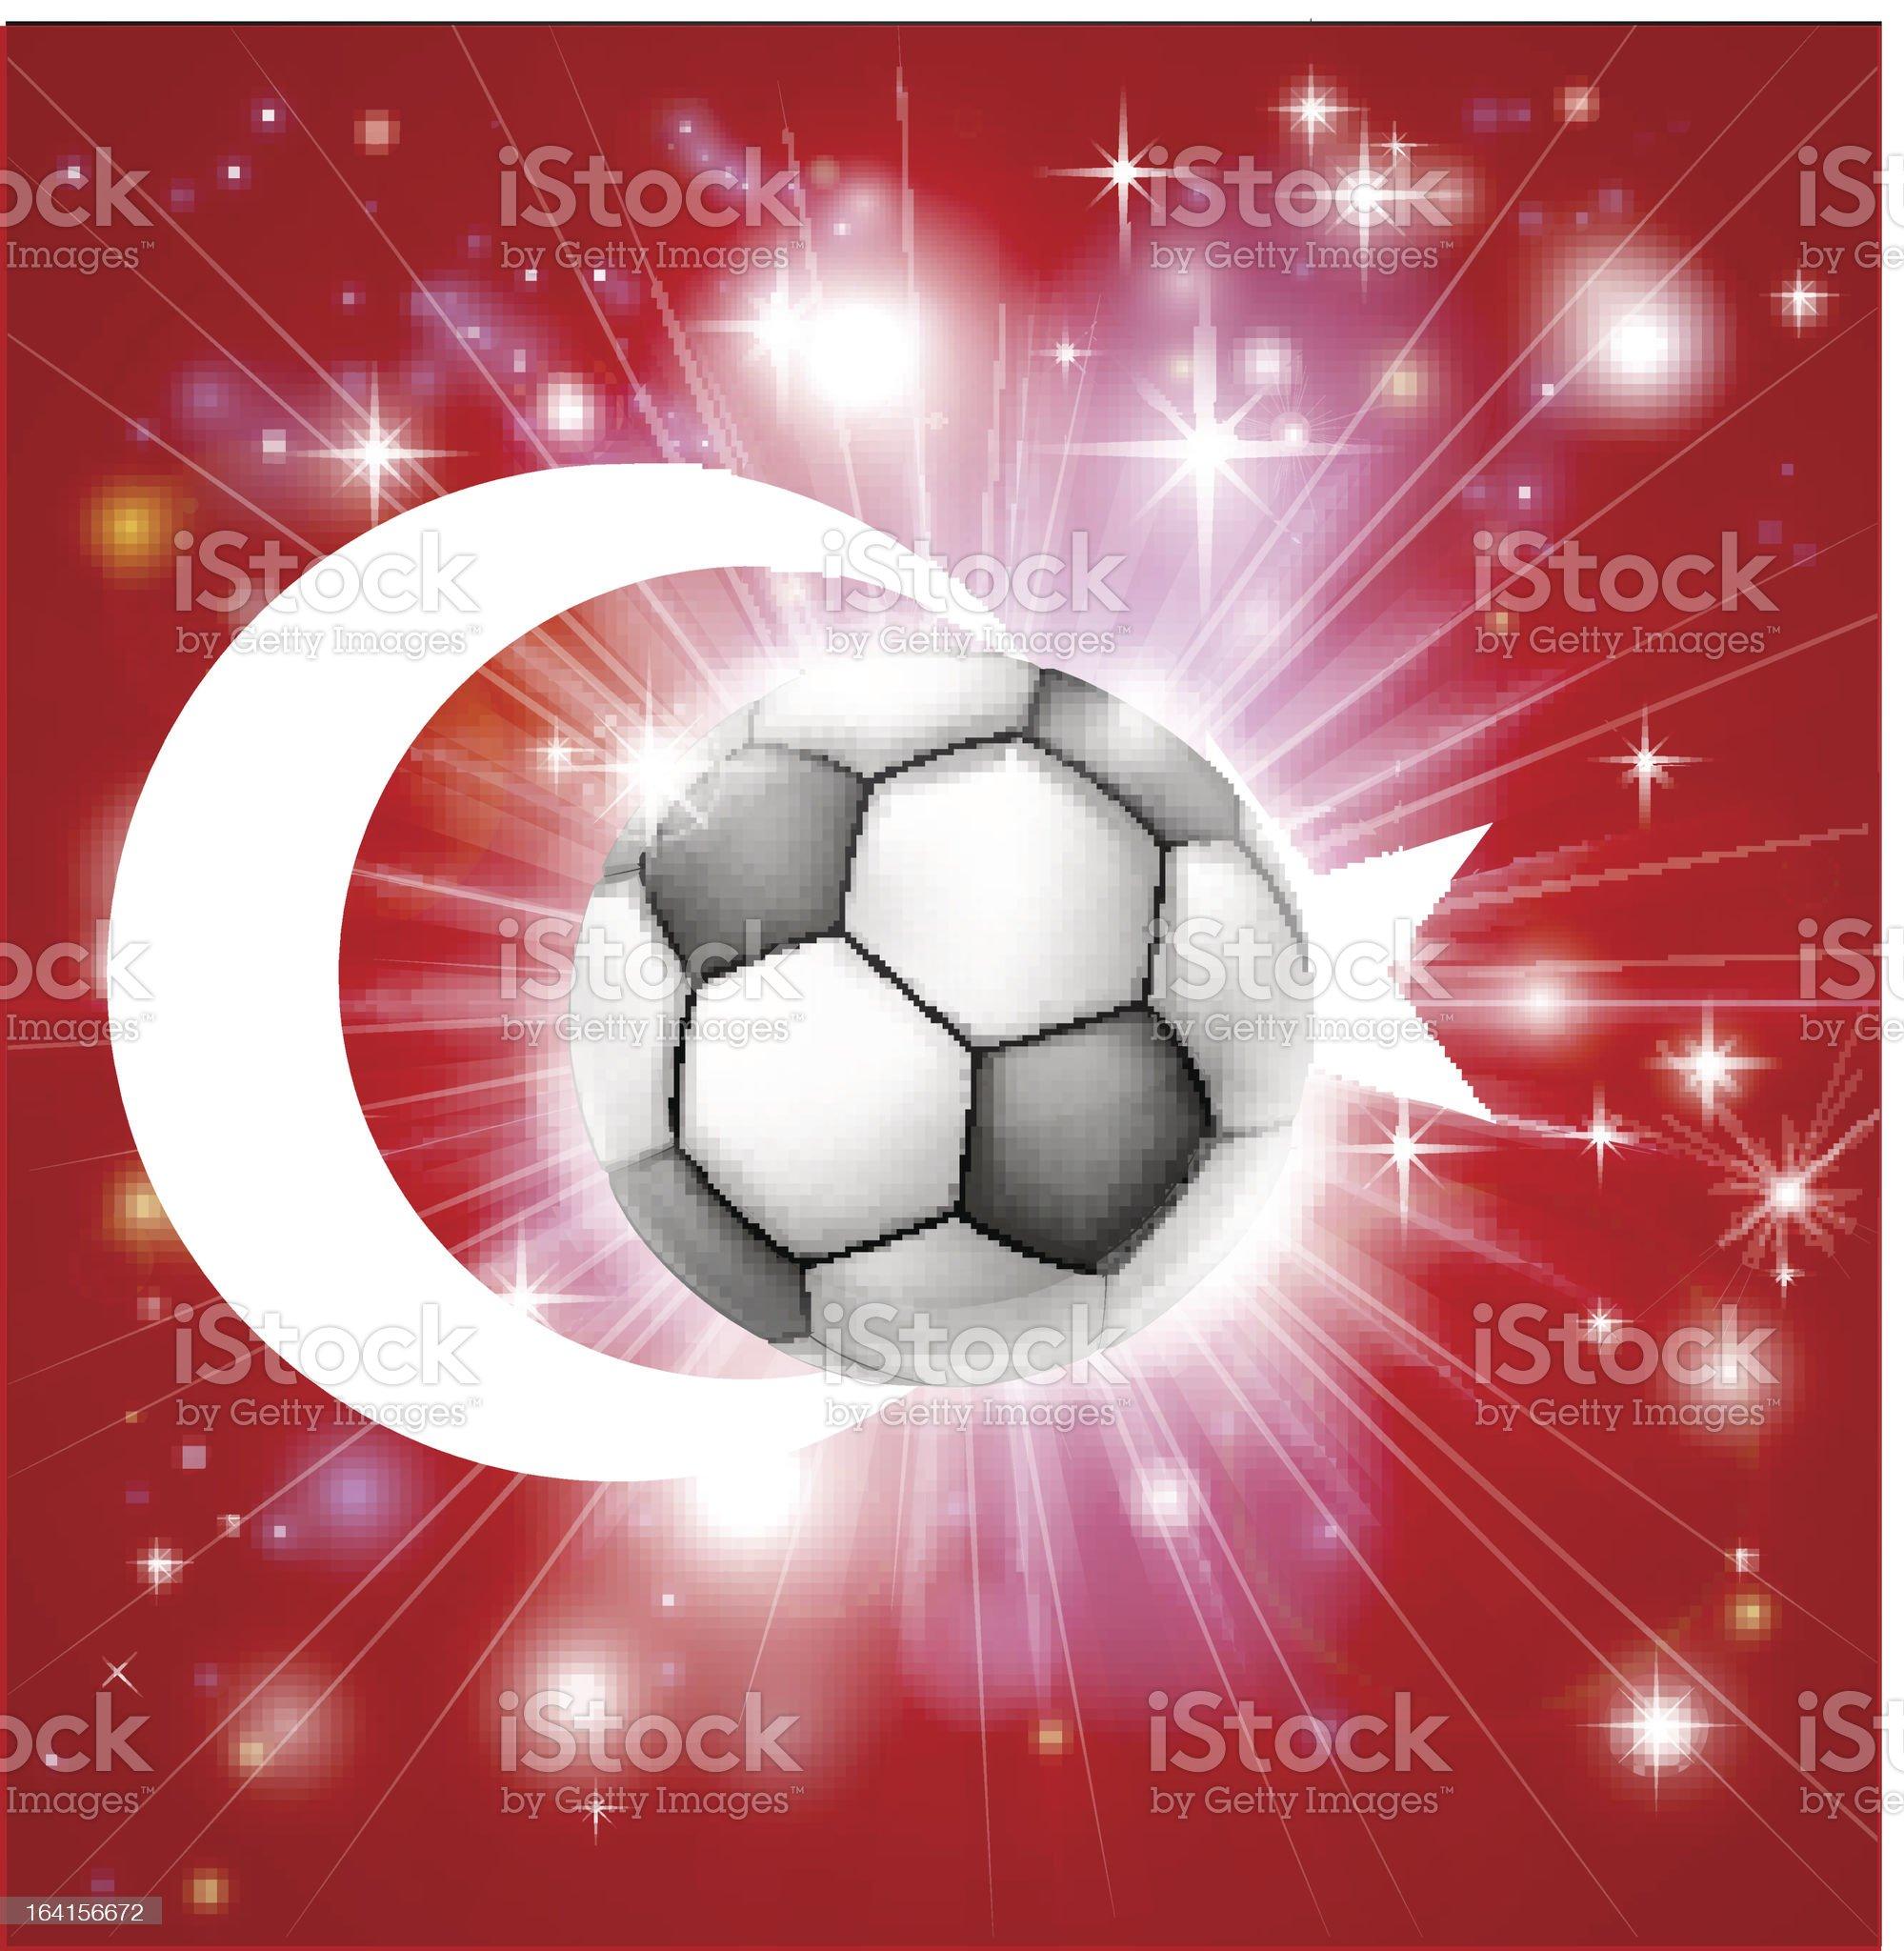 Turkey soccer flag royalty-free stock vector art